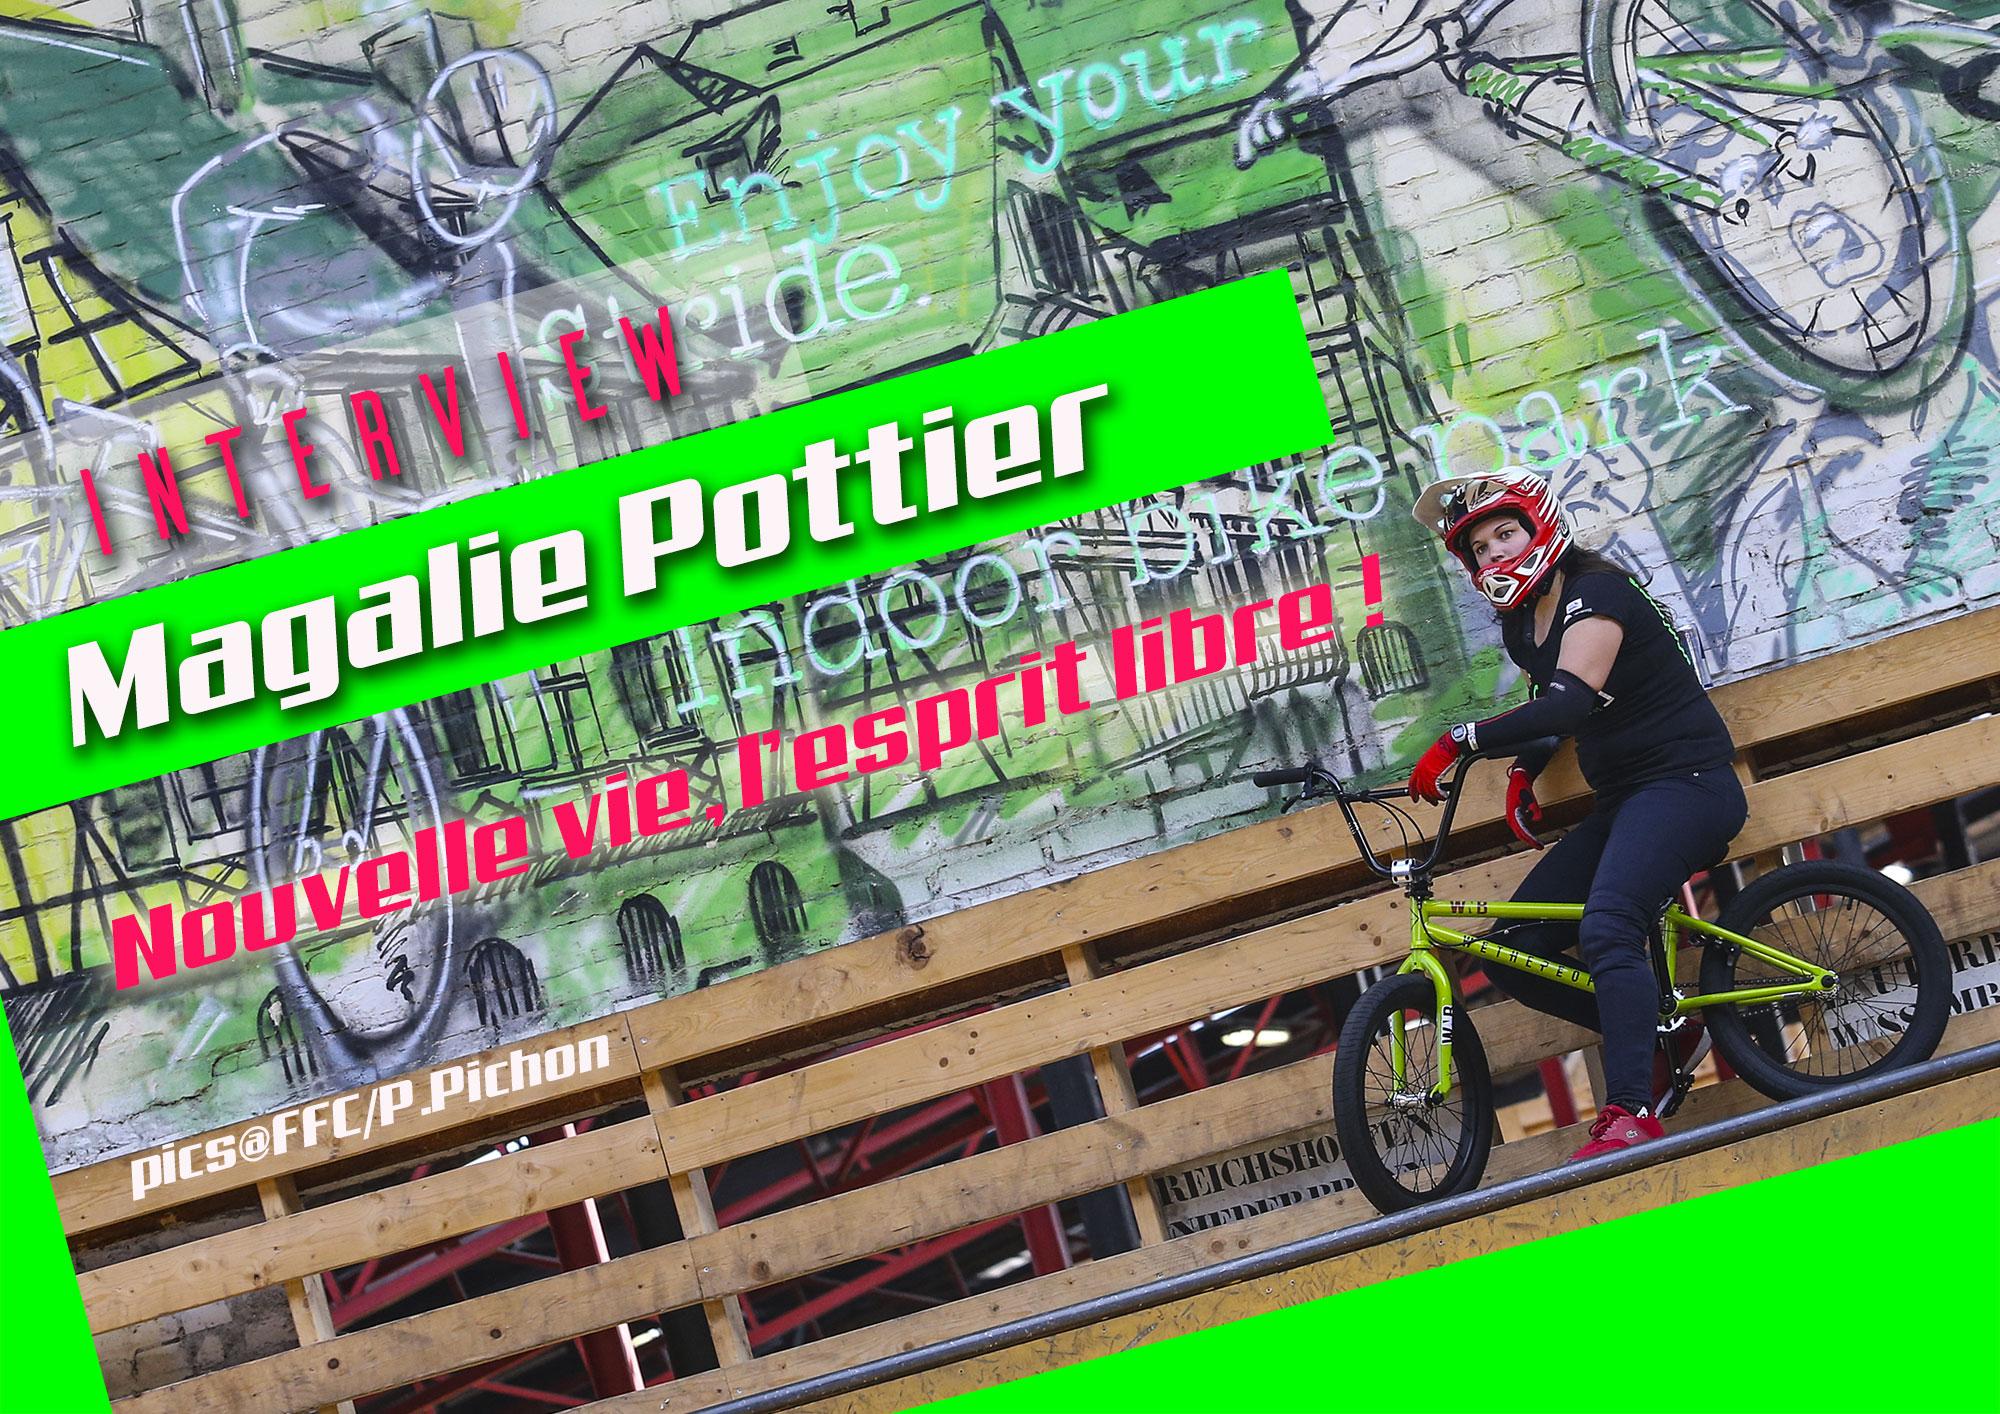 ITW Magalie POTTIER: En style libre !